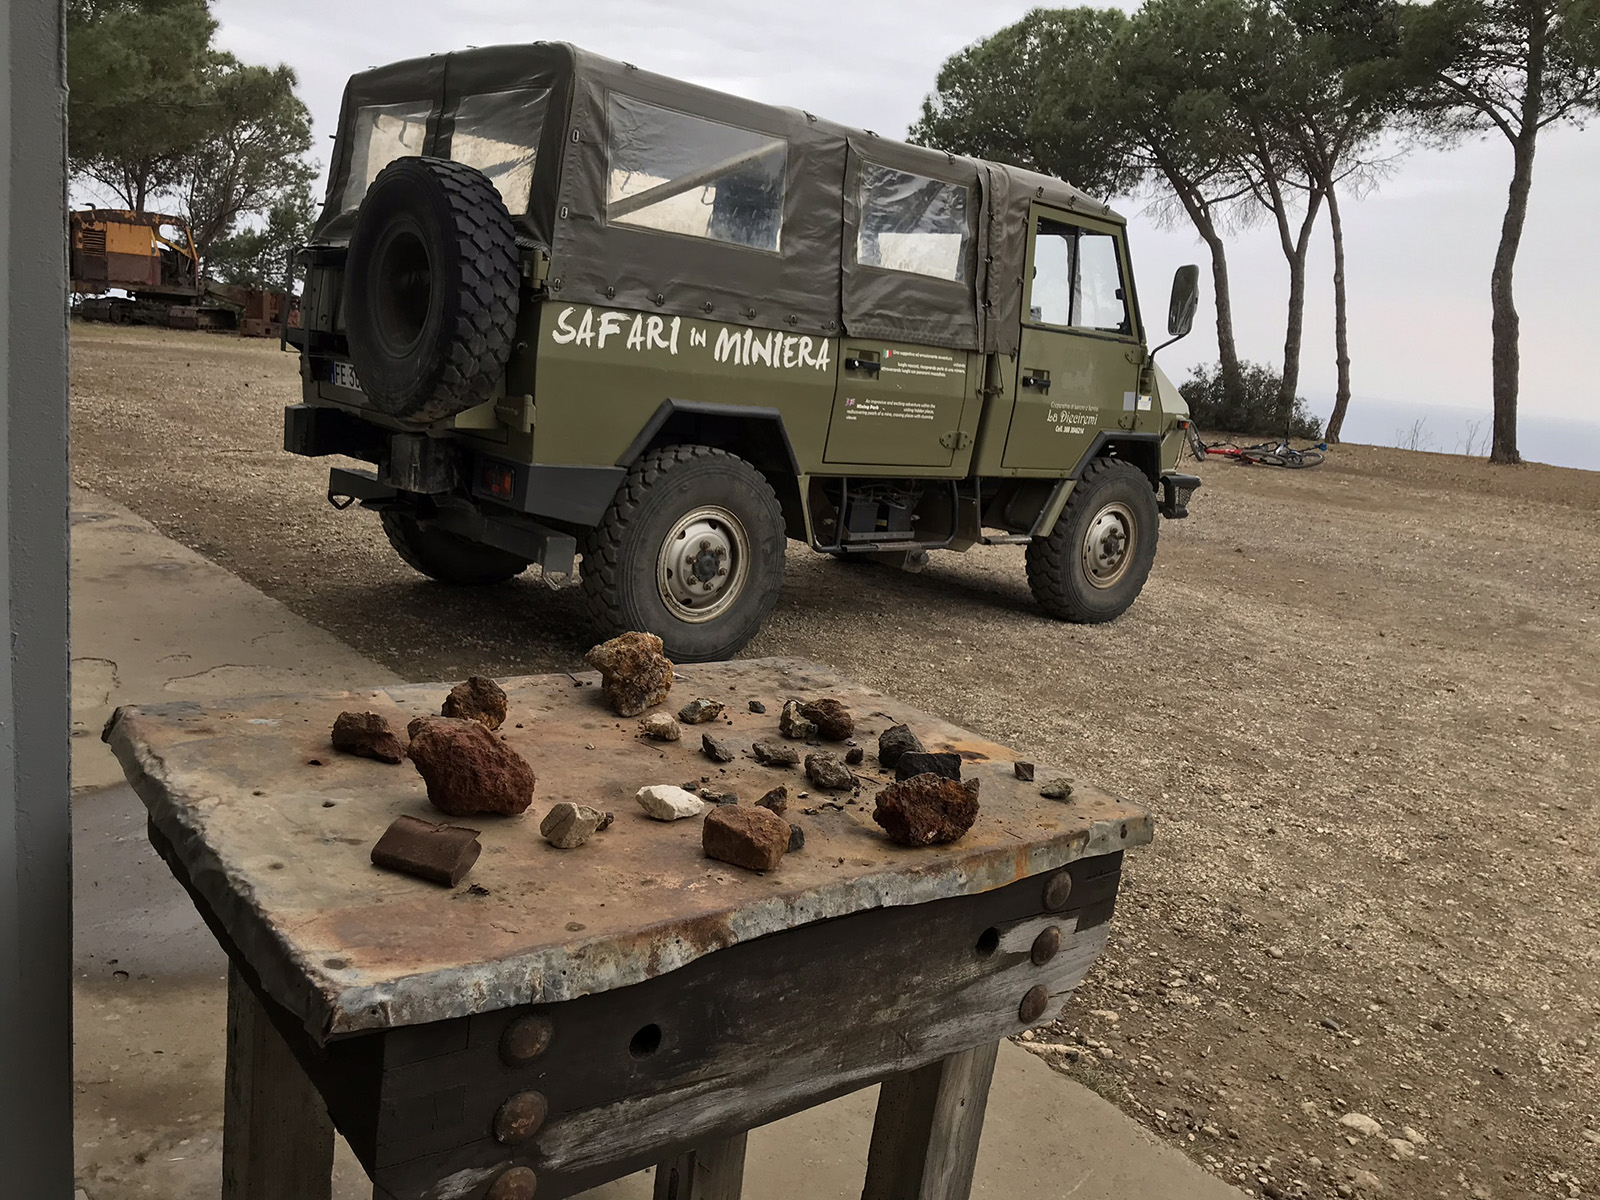 Safari in miniera Elba